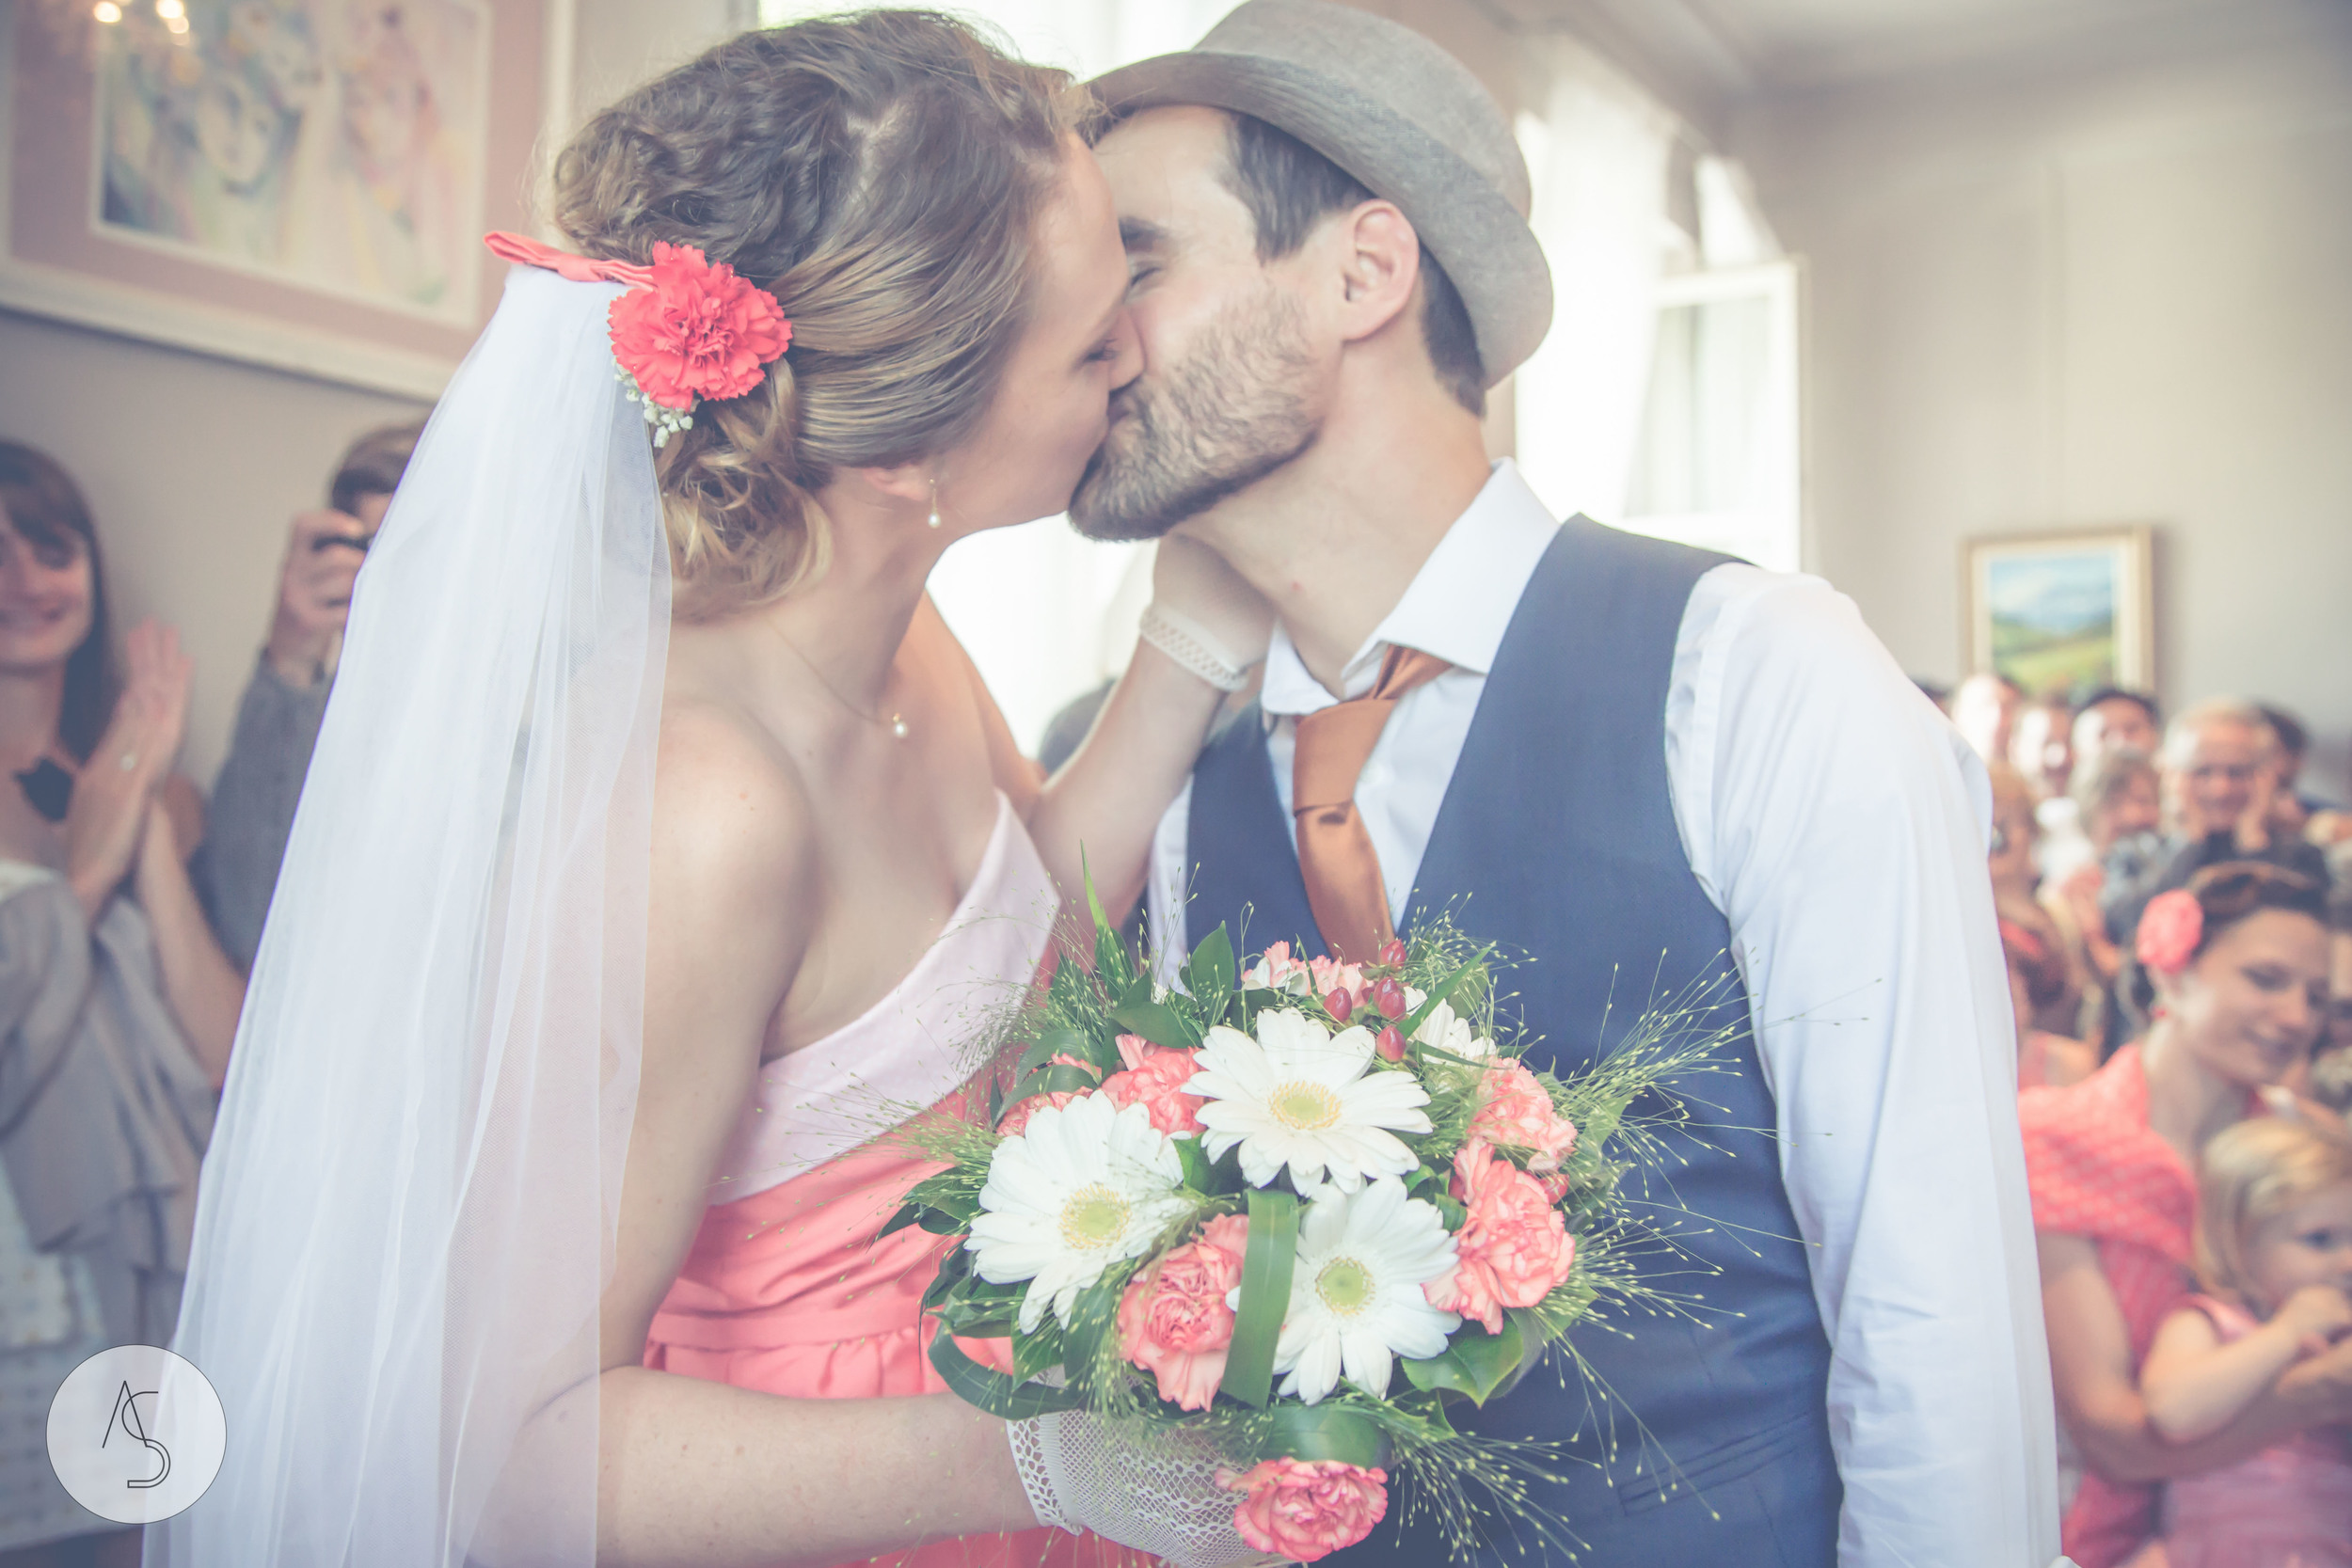 photographe mariage - Grenoble - Rhone Alpes - Adriana Salazar photo-72.jpg